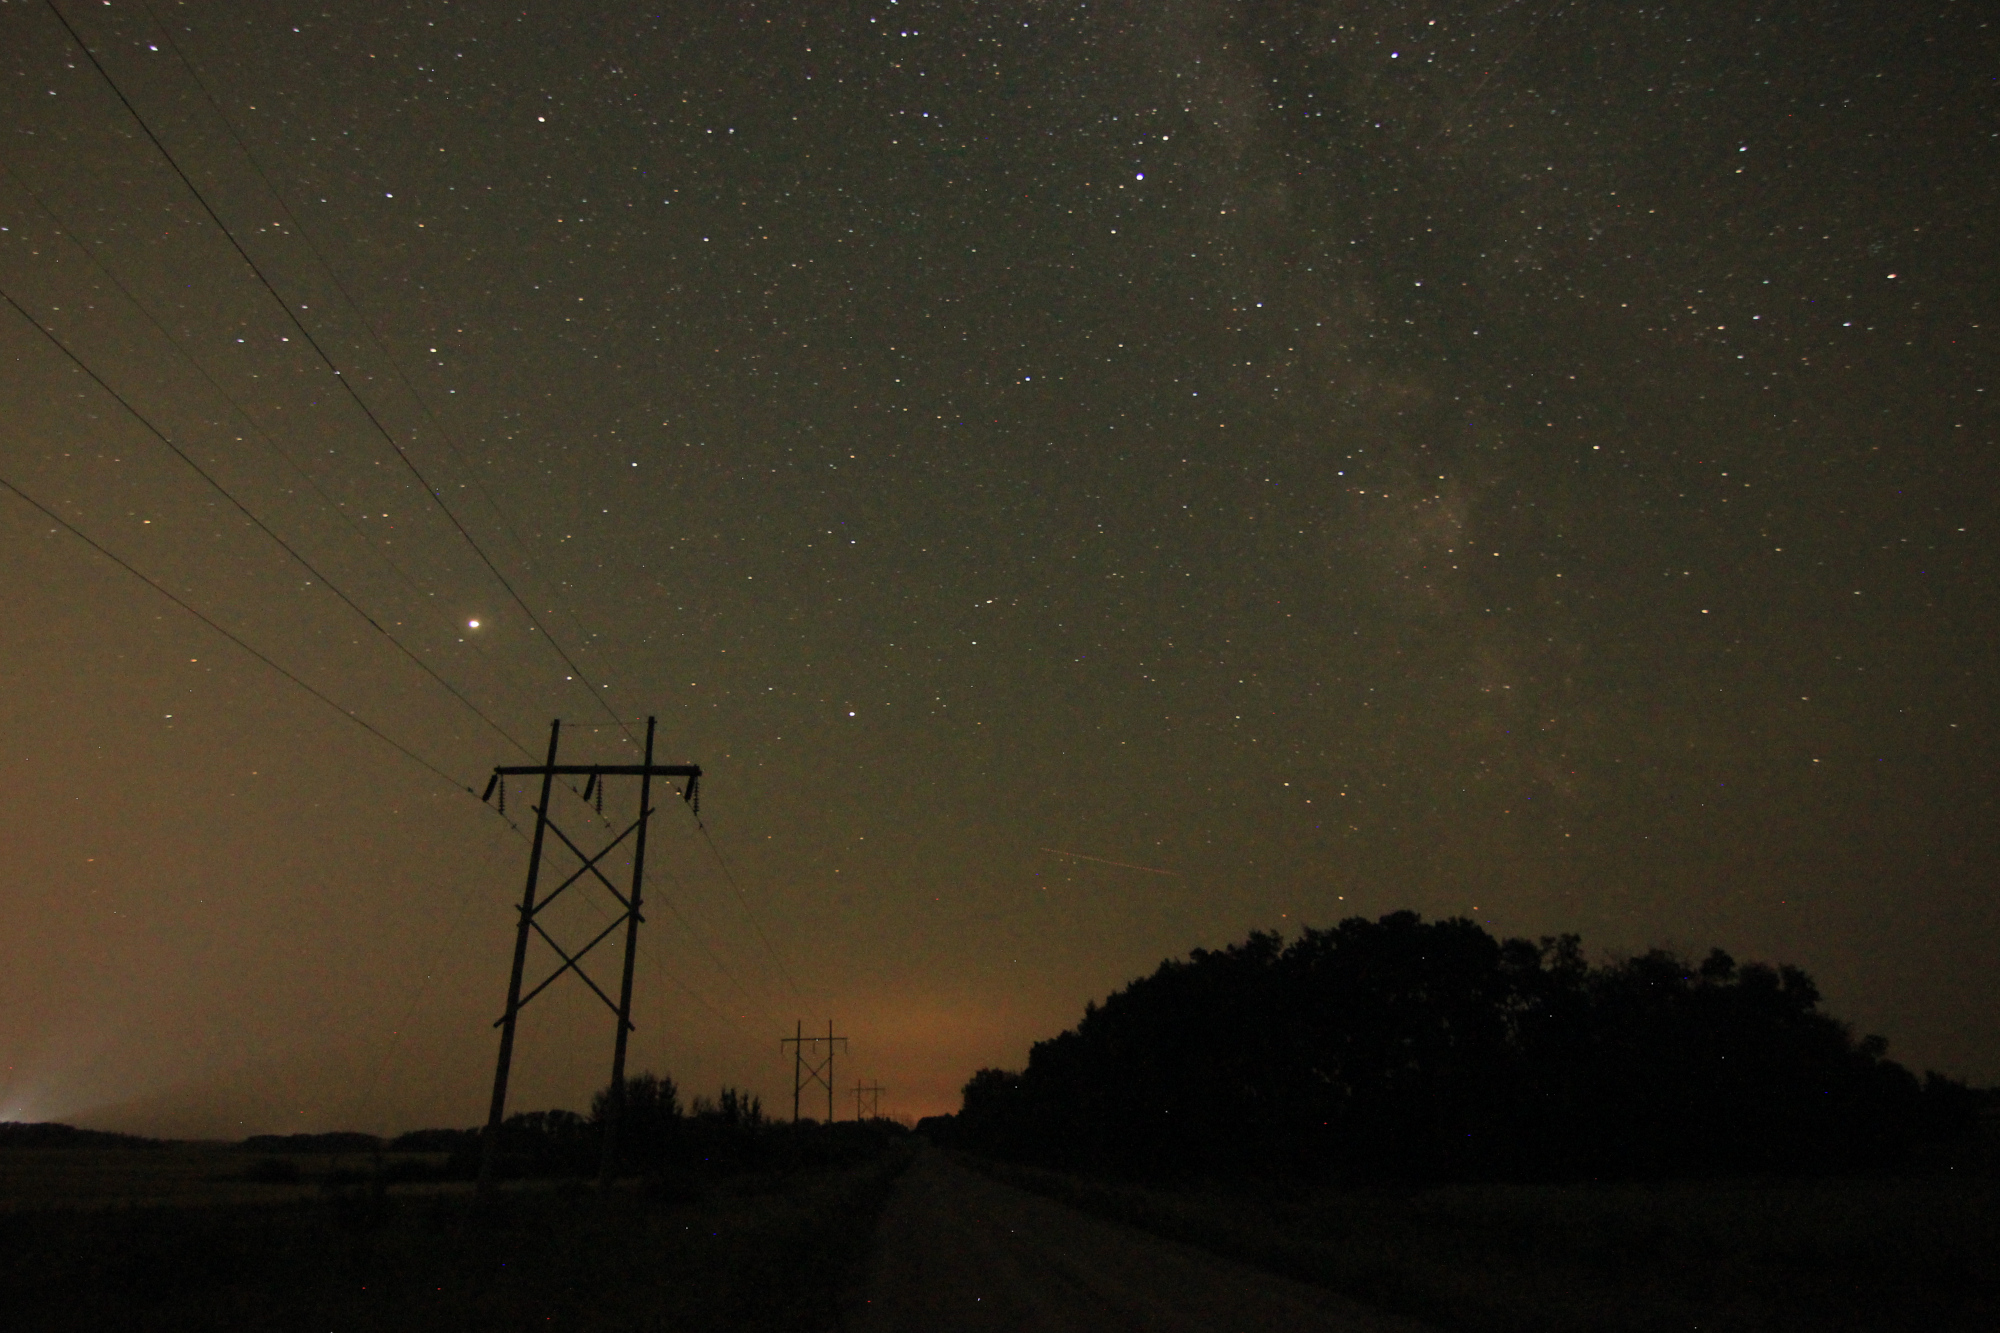 Milky Way (unprocessed photo)